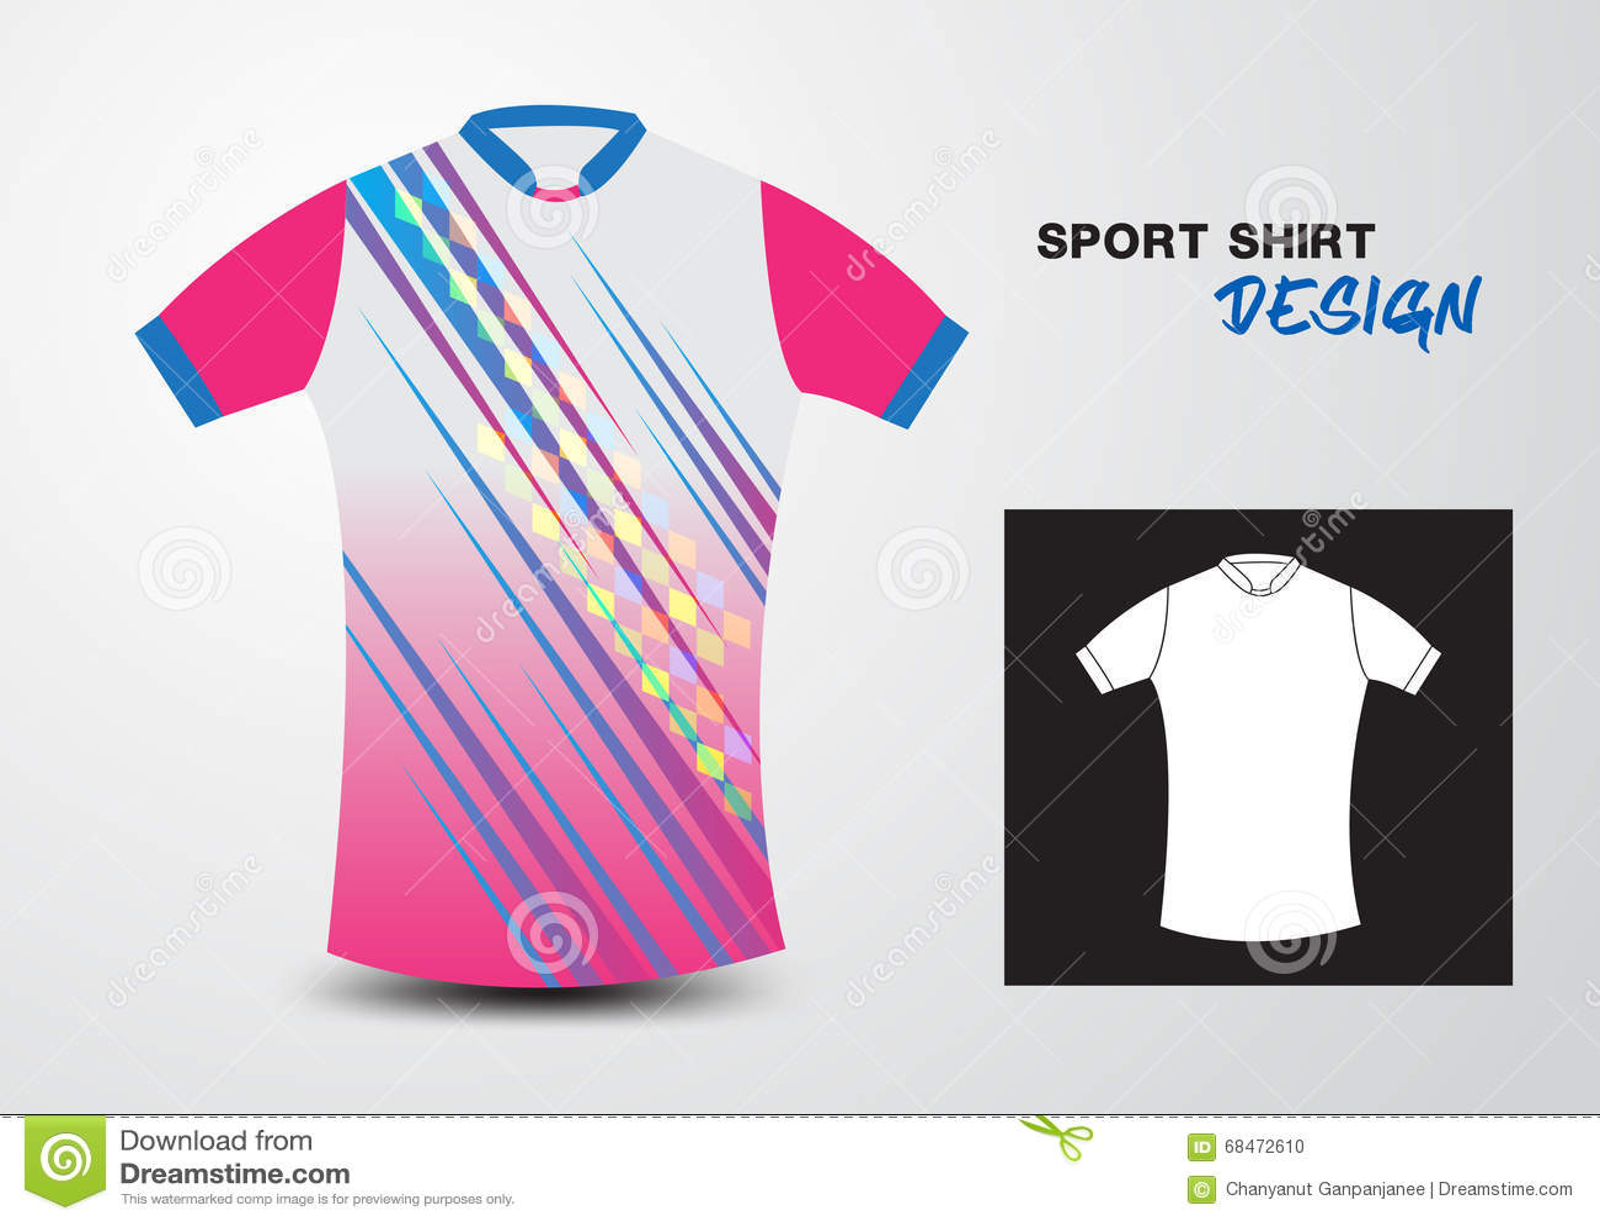 Pink Sport Shirt Design Vector Illustration Stock Vector - Image ...